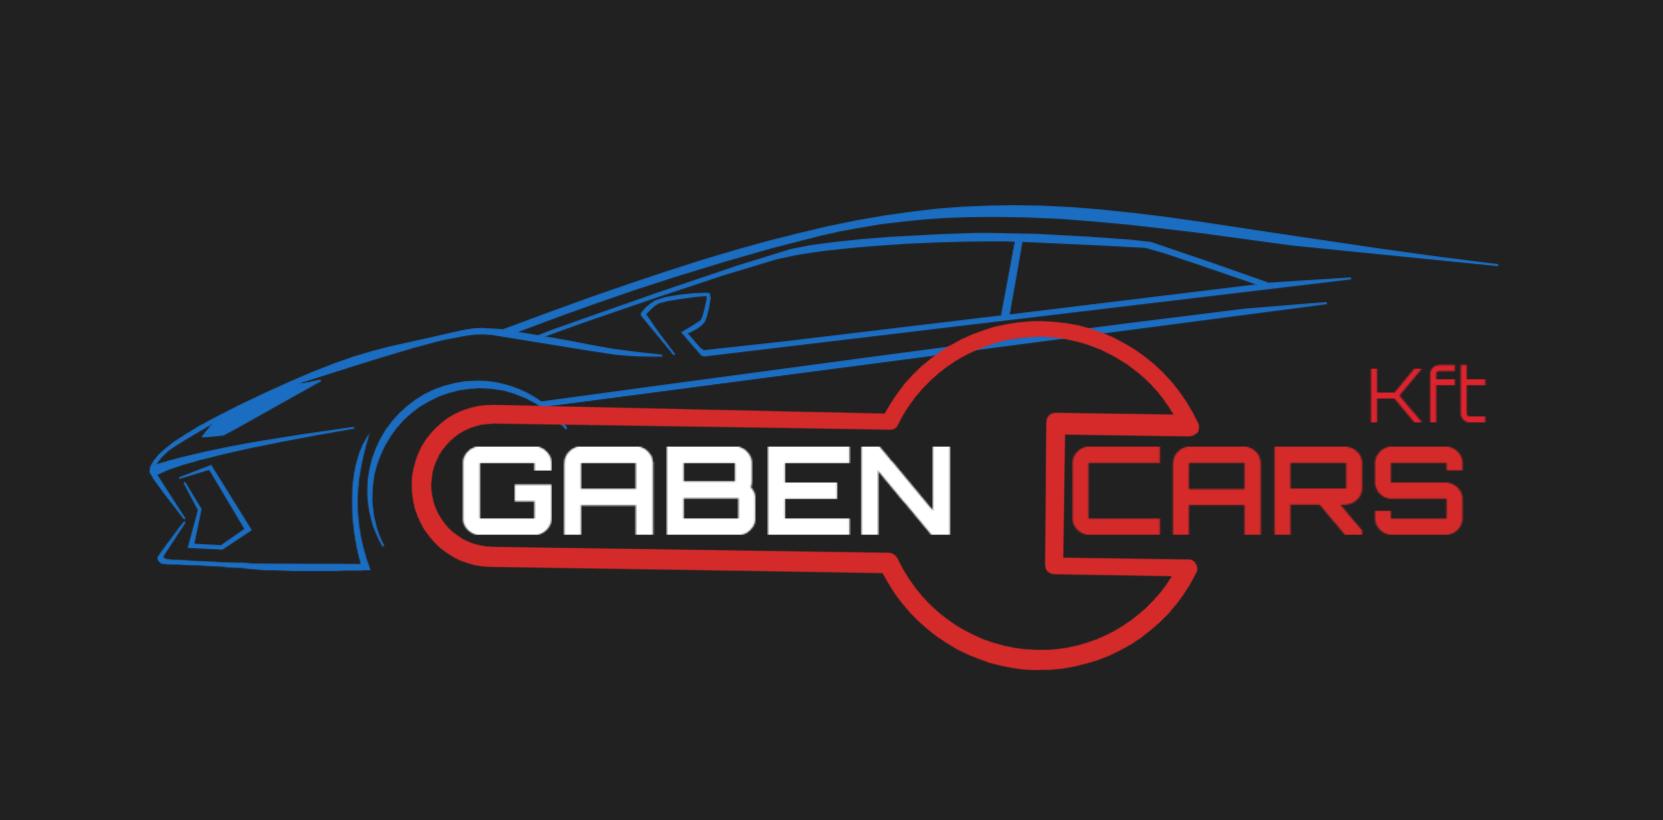 Gaben-Cars.hu